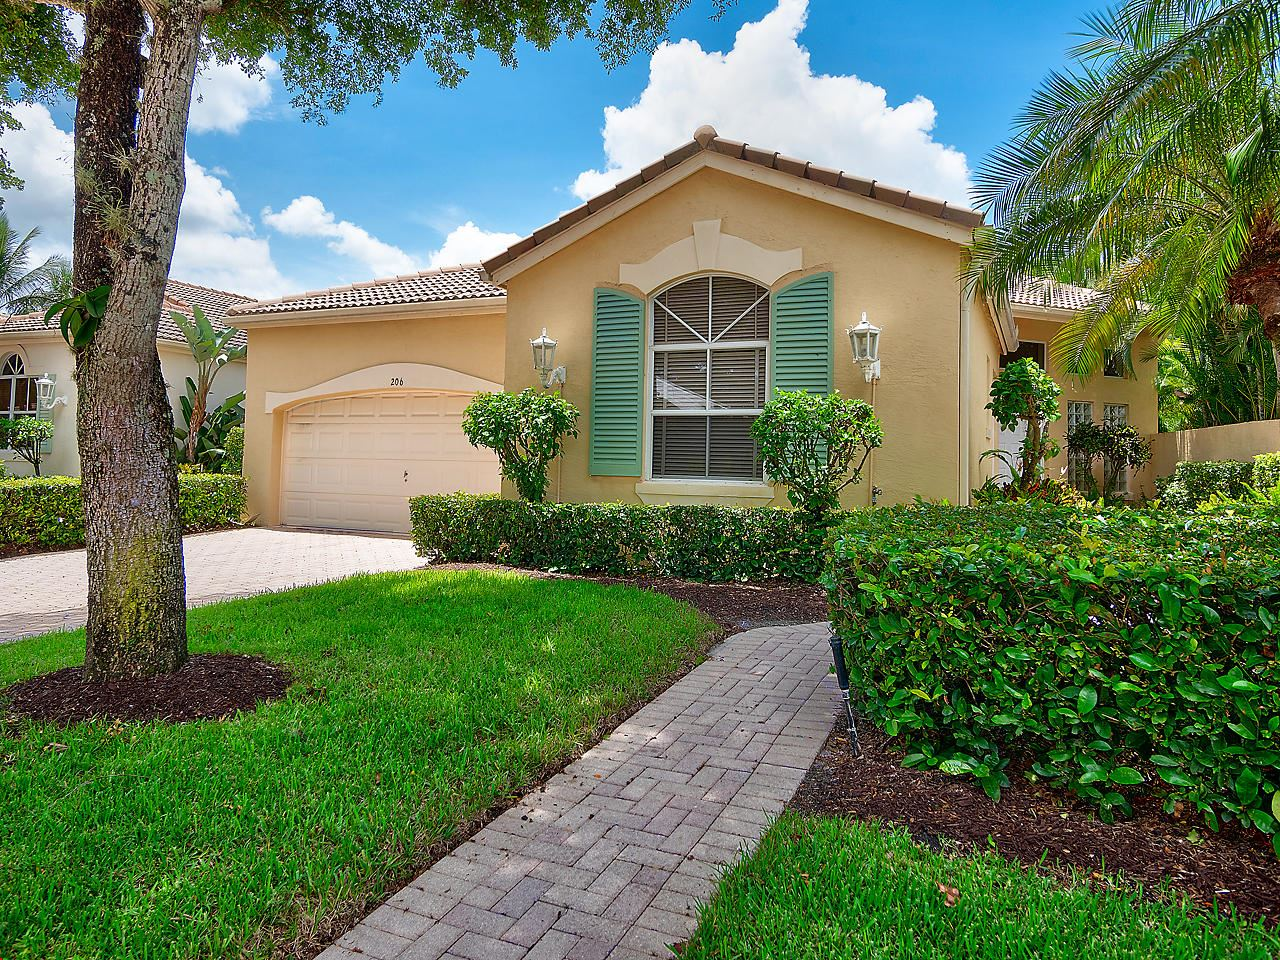 Photo of 206 Sunset Bay Court, Palm Beach Gardens, FL 33418 (MLS # RX-10644292)